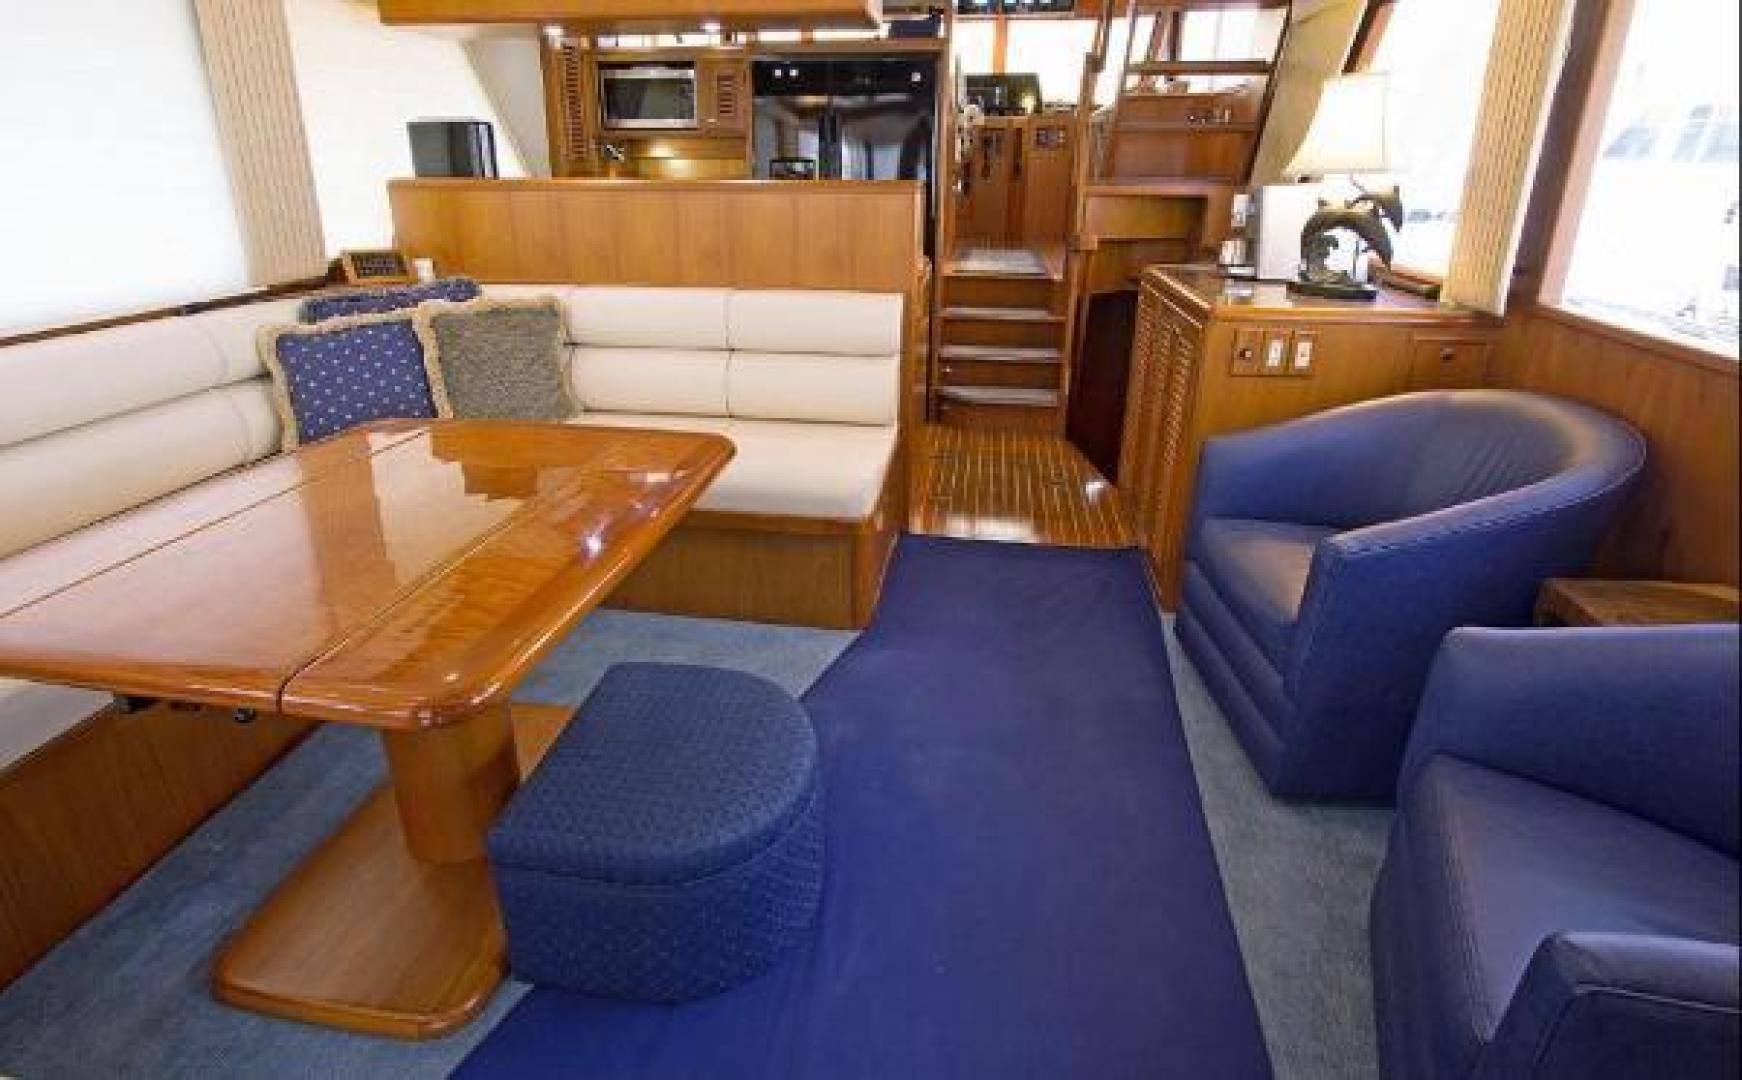 Offshore Yachts-62 Pilot House 2001-Sandman II Fort Lauderdale-Florida-United States-1367888   Thumbnail